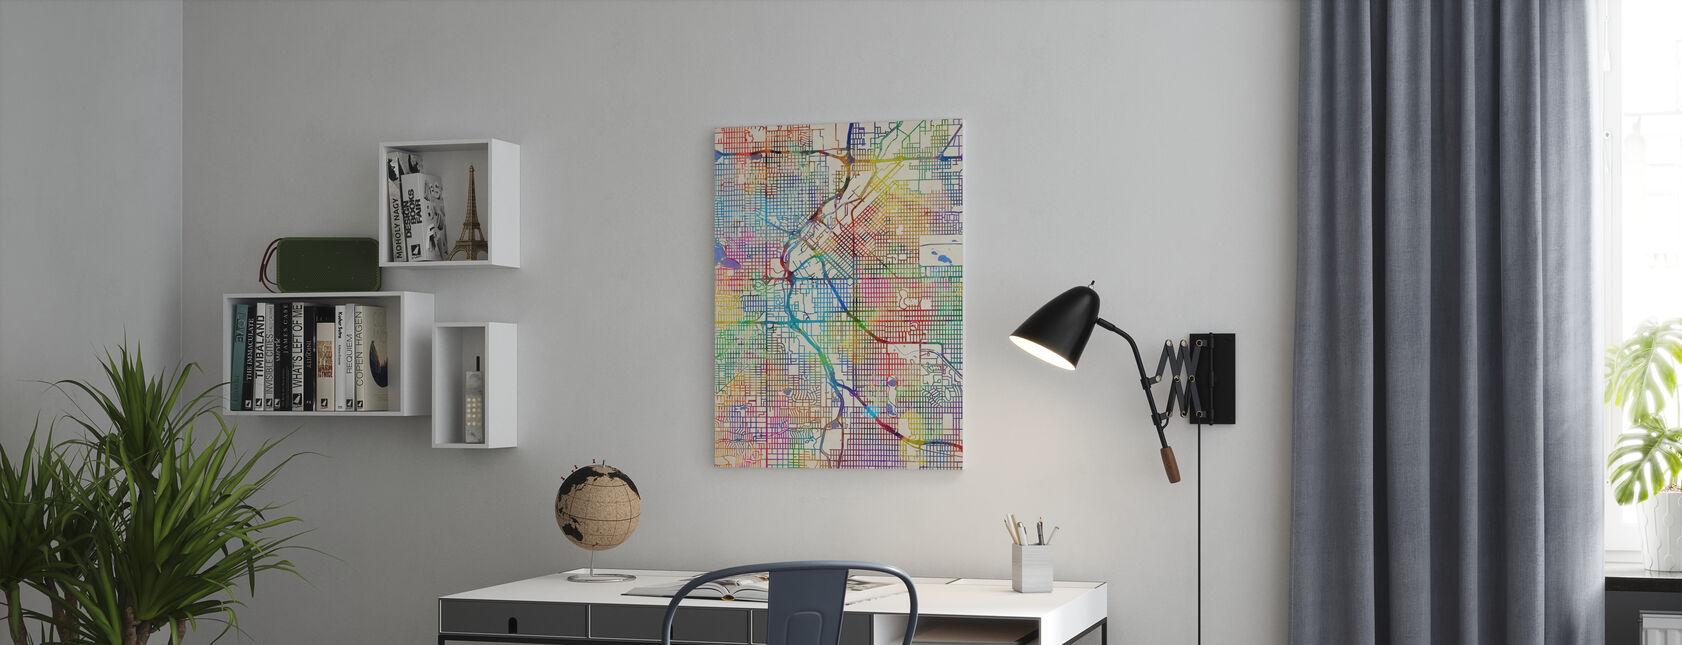 Denver Colorado Street Map - Canvas print - Office